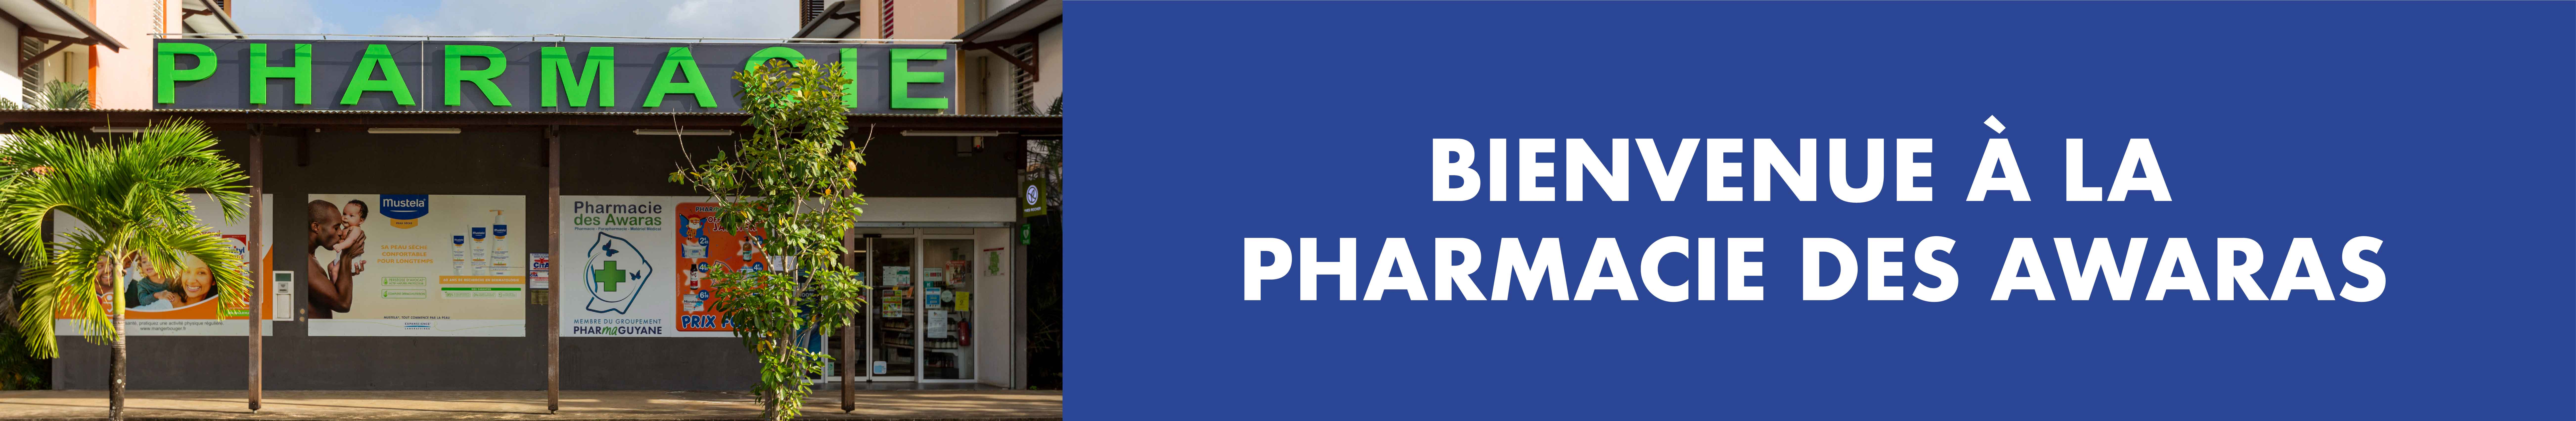 Bannière Pharma Guyane 02